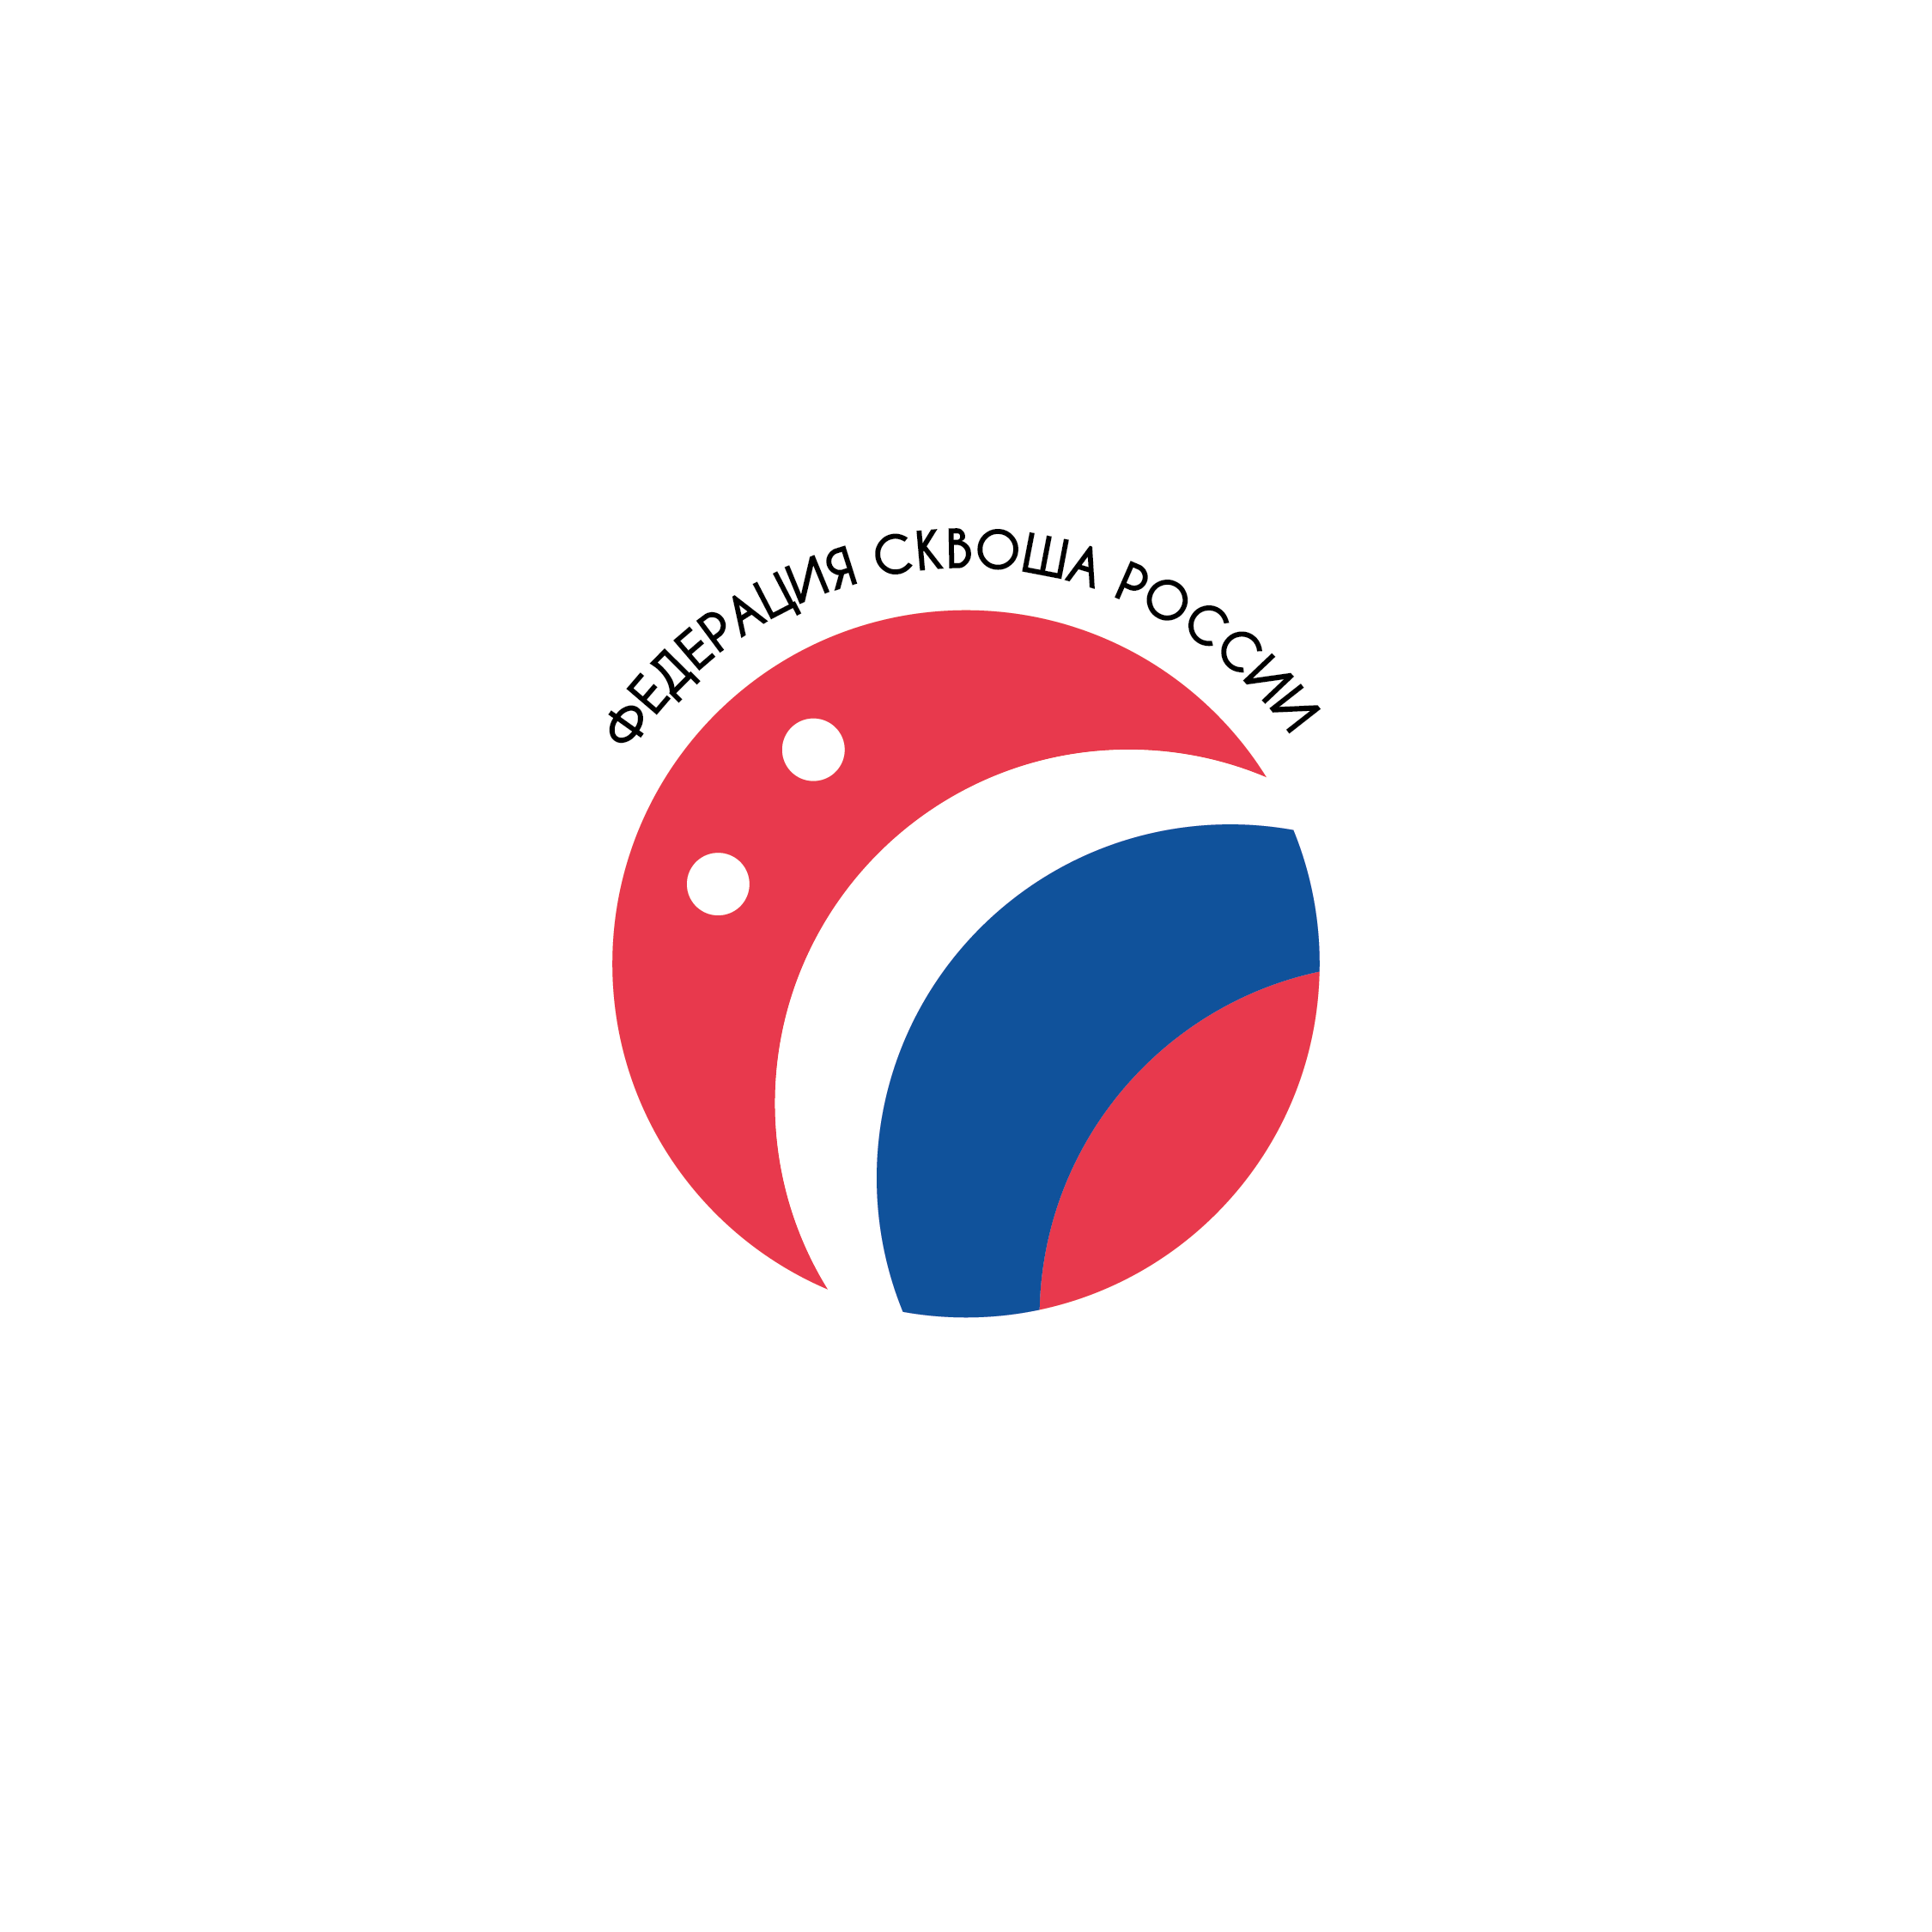 Разработать логотип для Федерации сквоша России фото f_2725f30fe82622cf.png